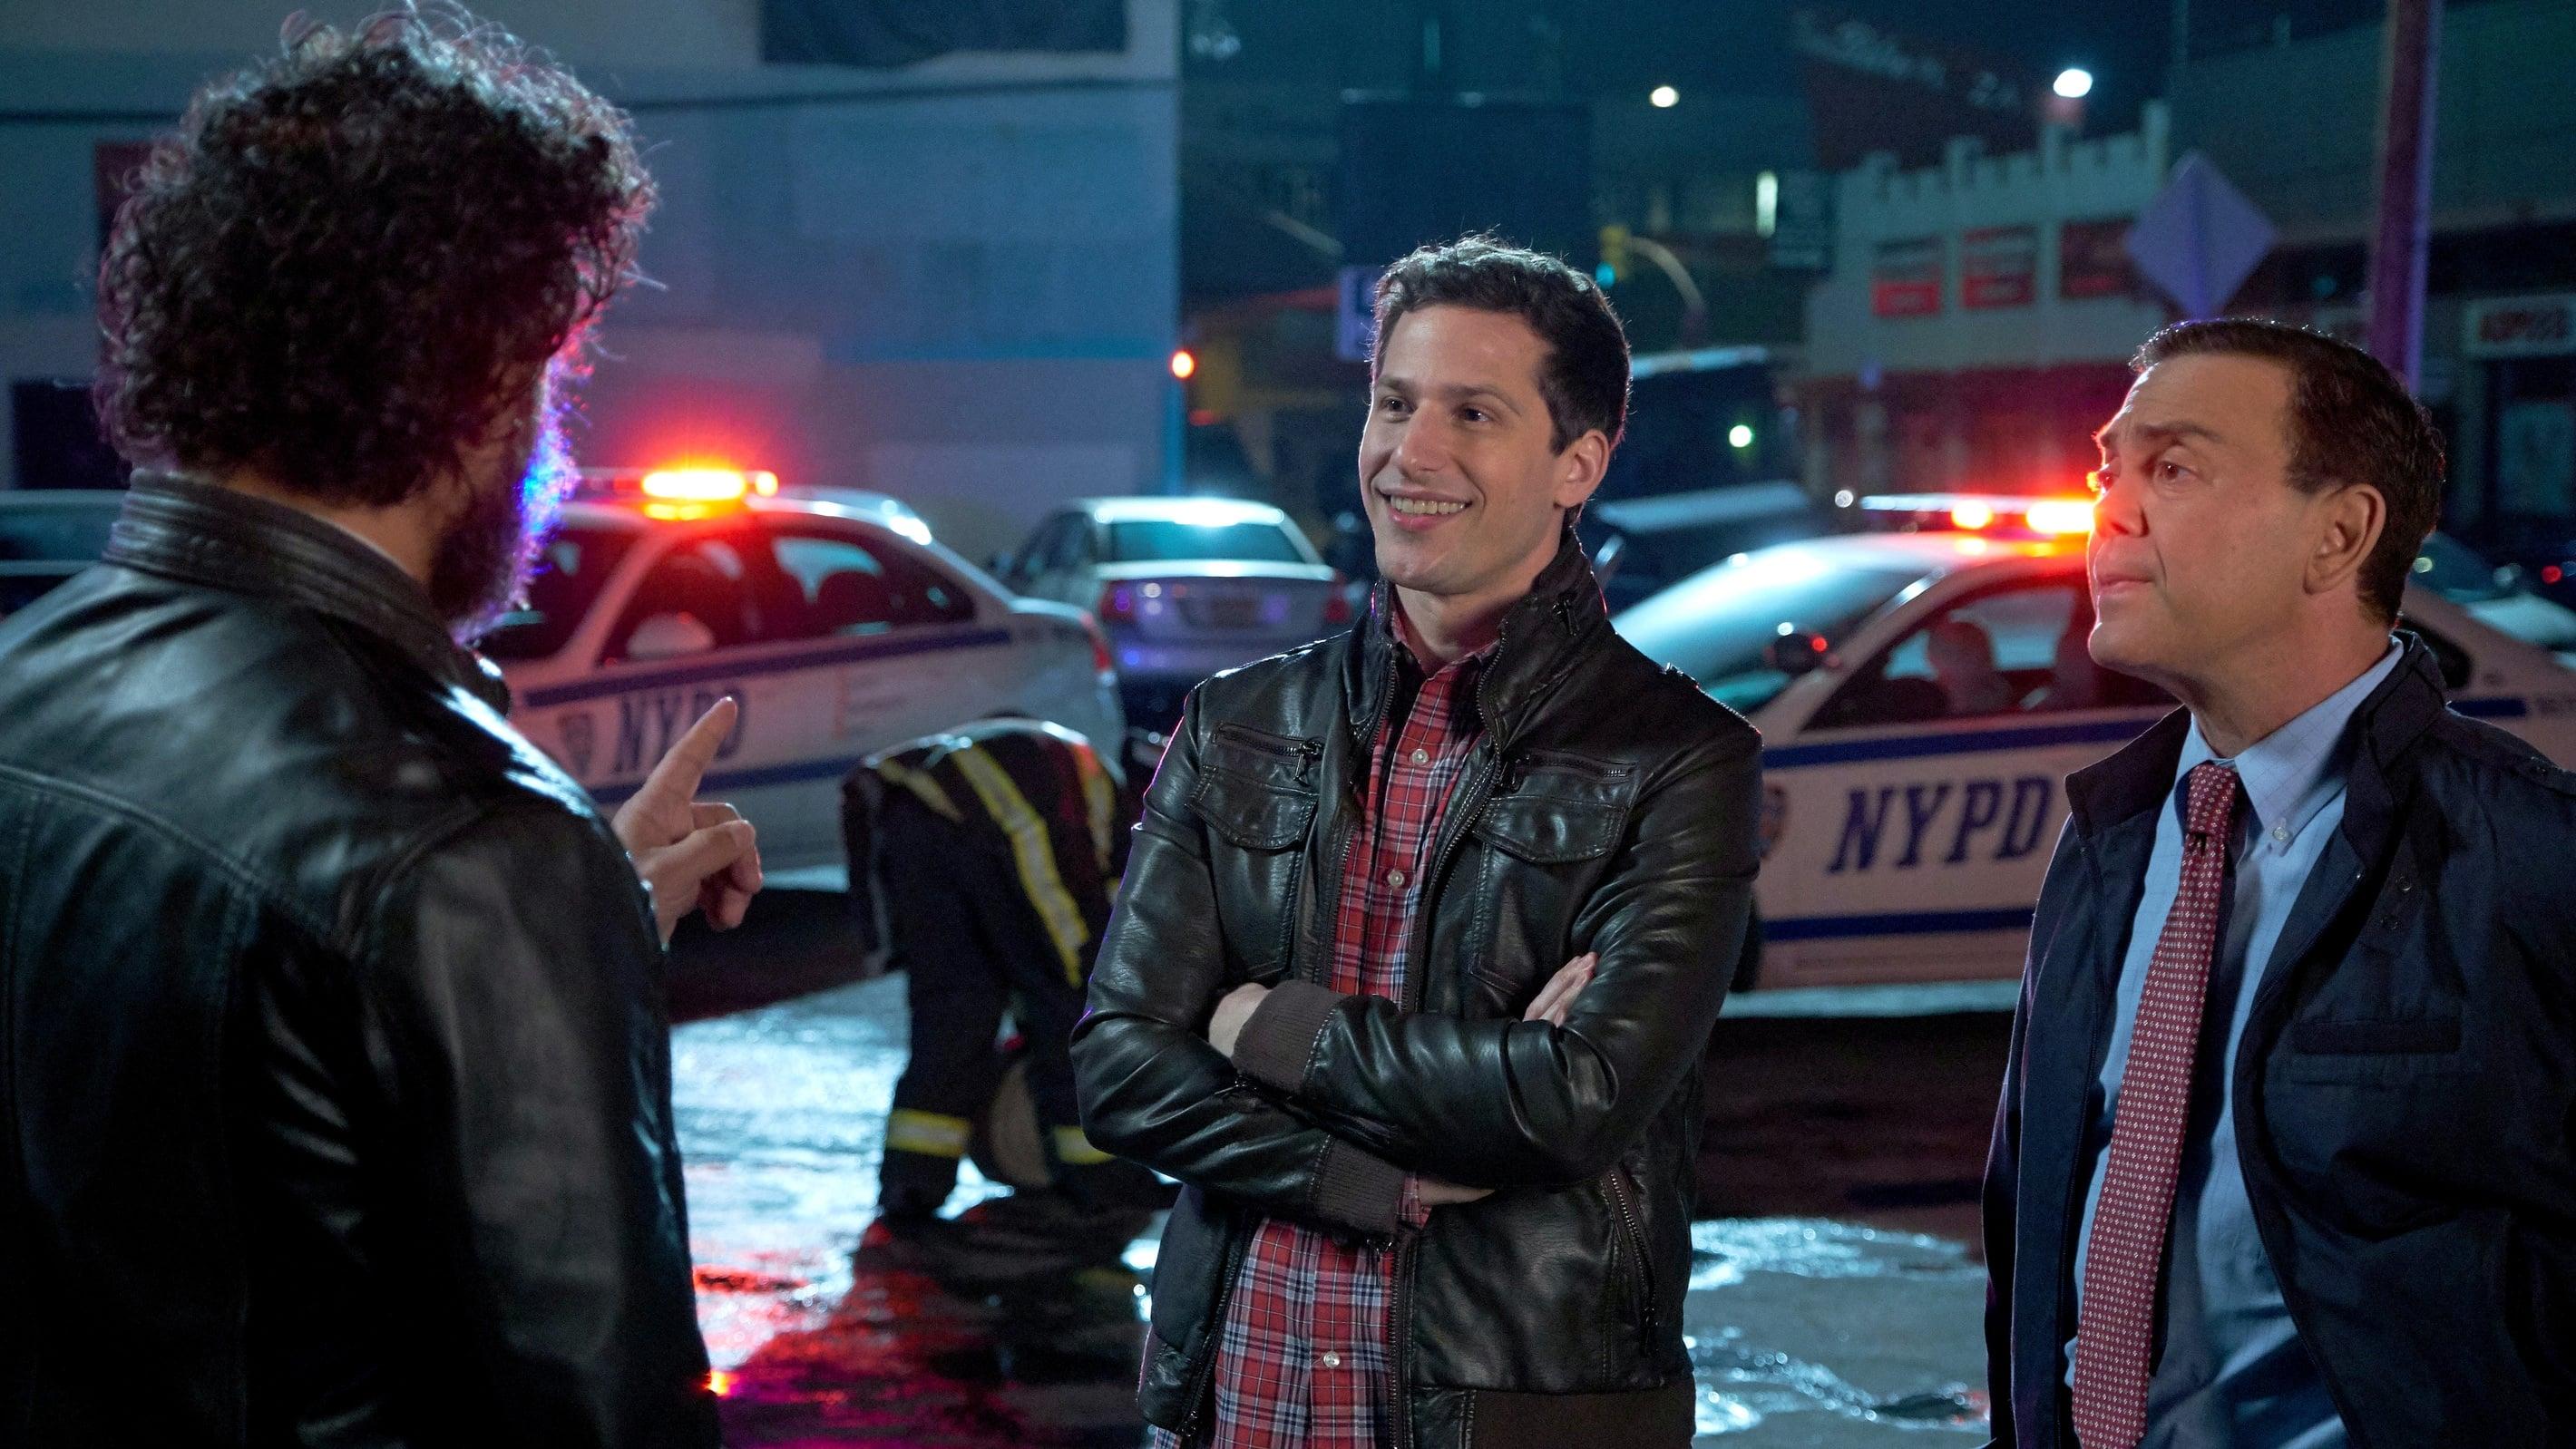 Brooklyn Nine-Nine - Season 5 Episode 18 : Gray Star Mutual